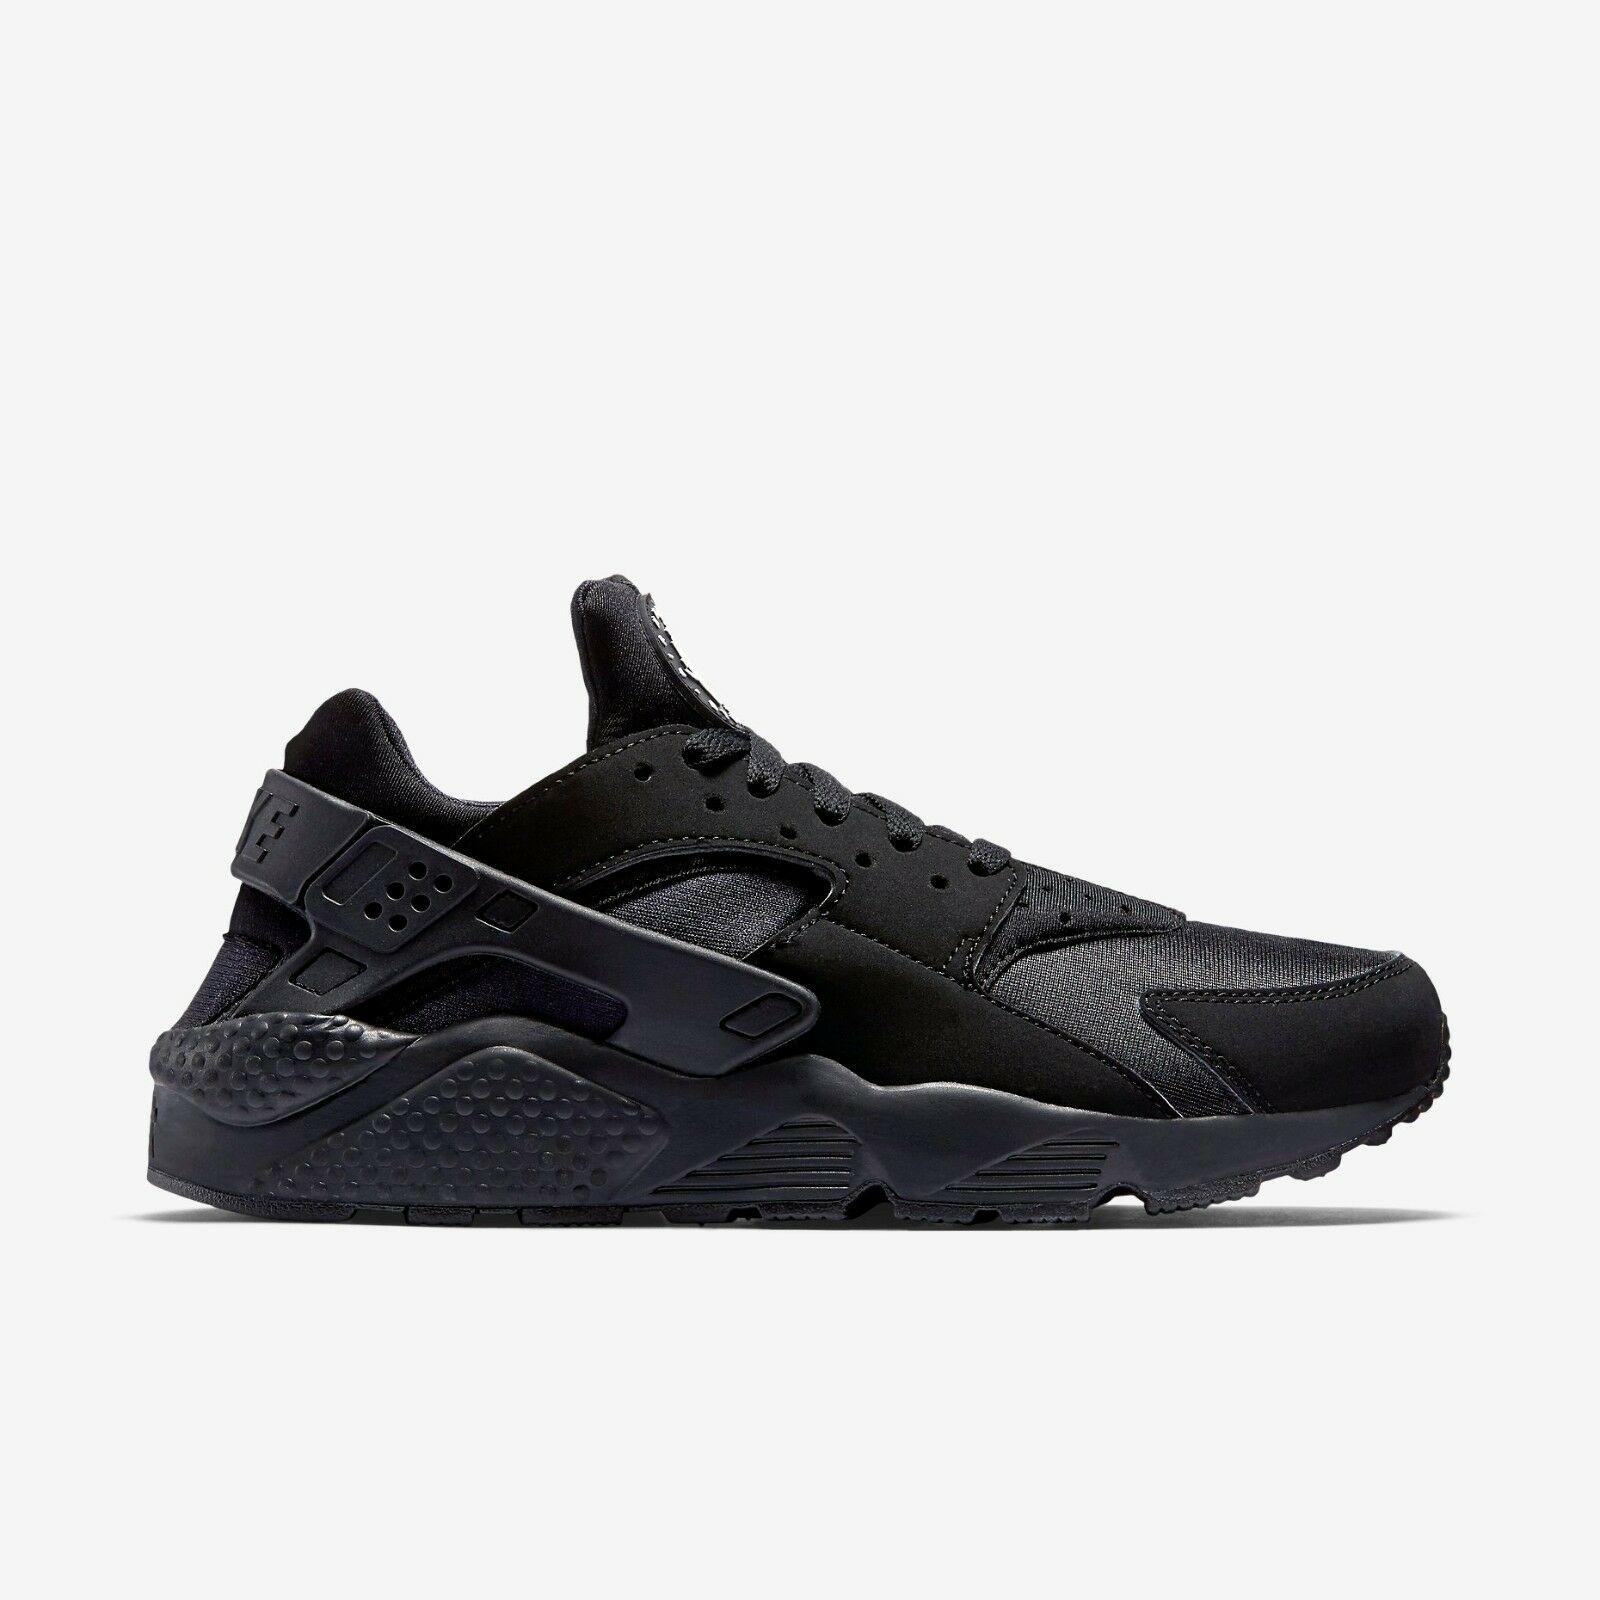 New Nike Men's Air Huarache Running shoes (318429-003)  Black   White-Black